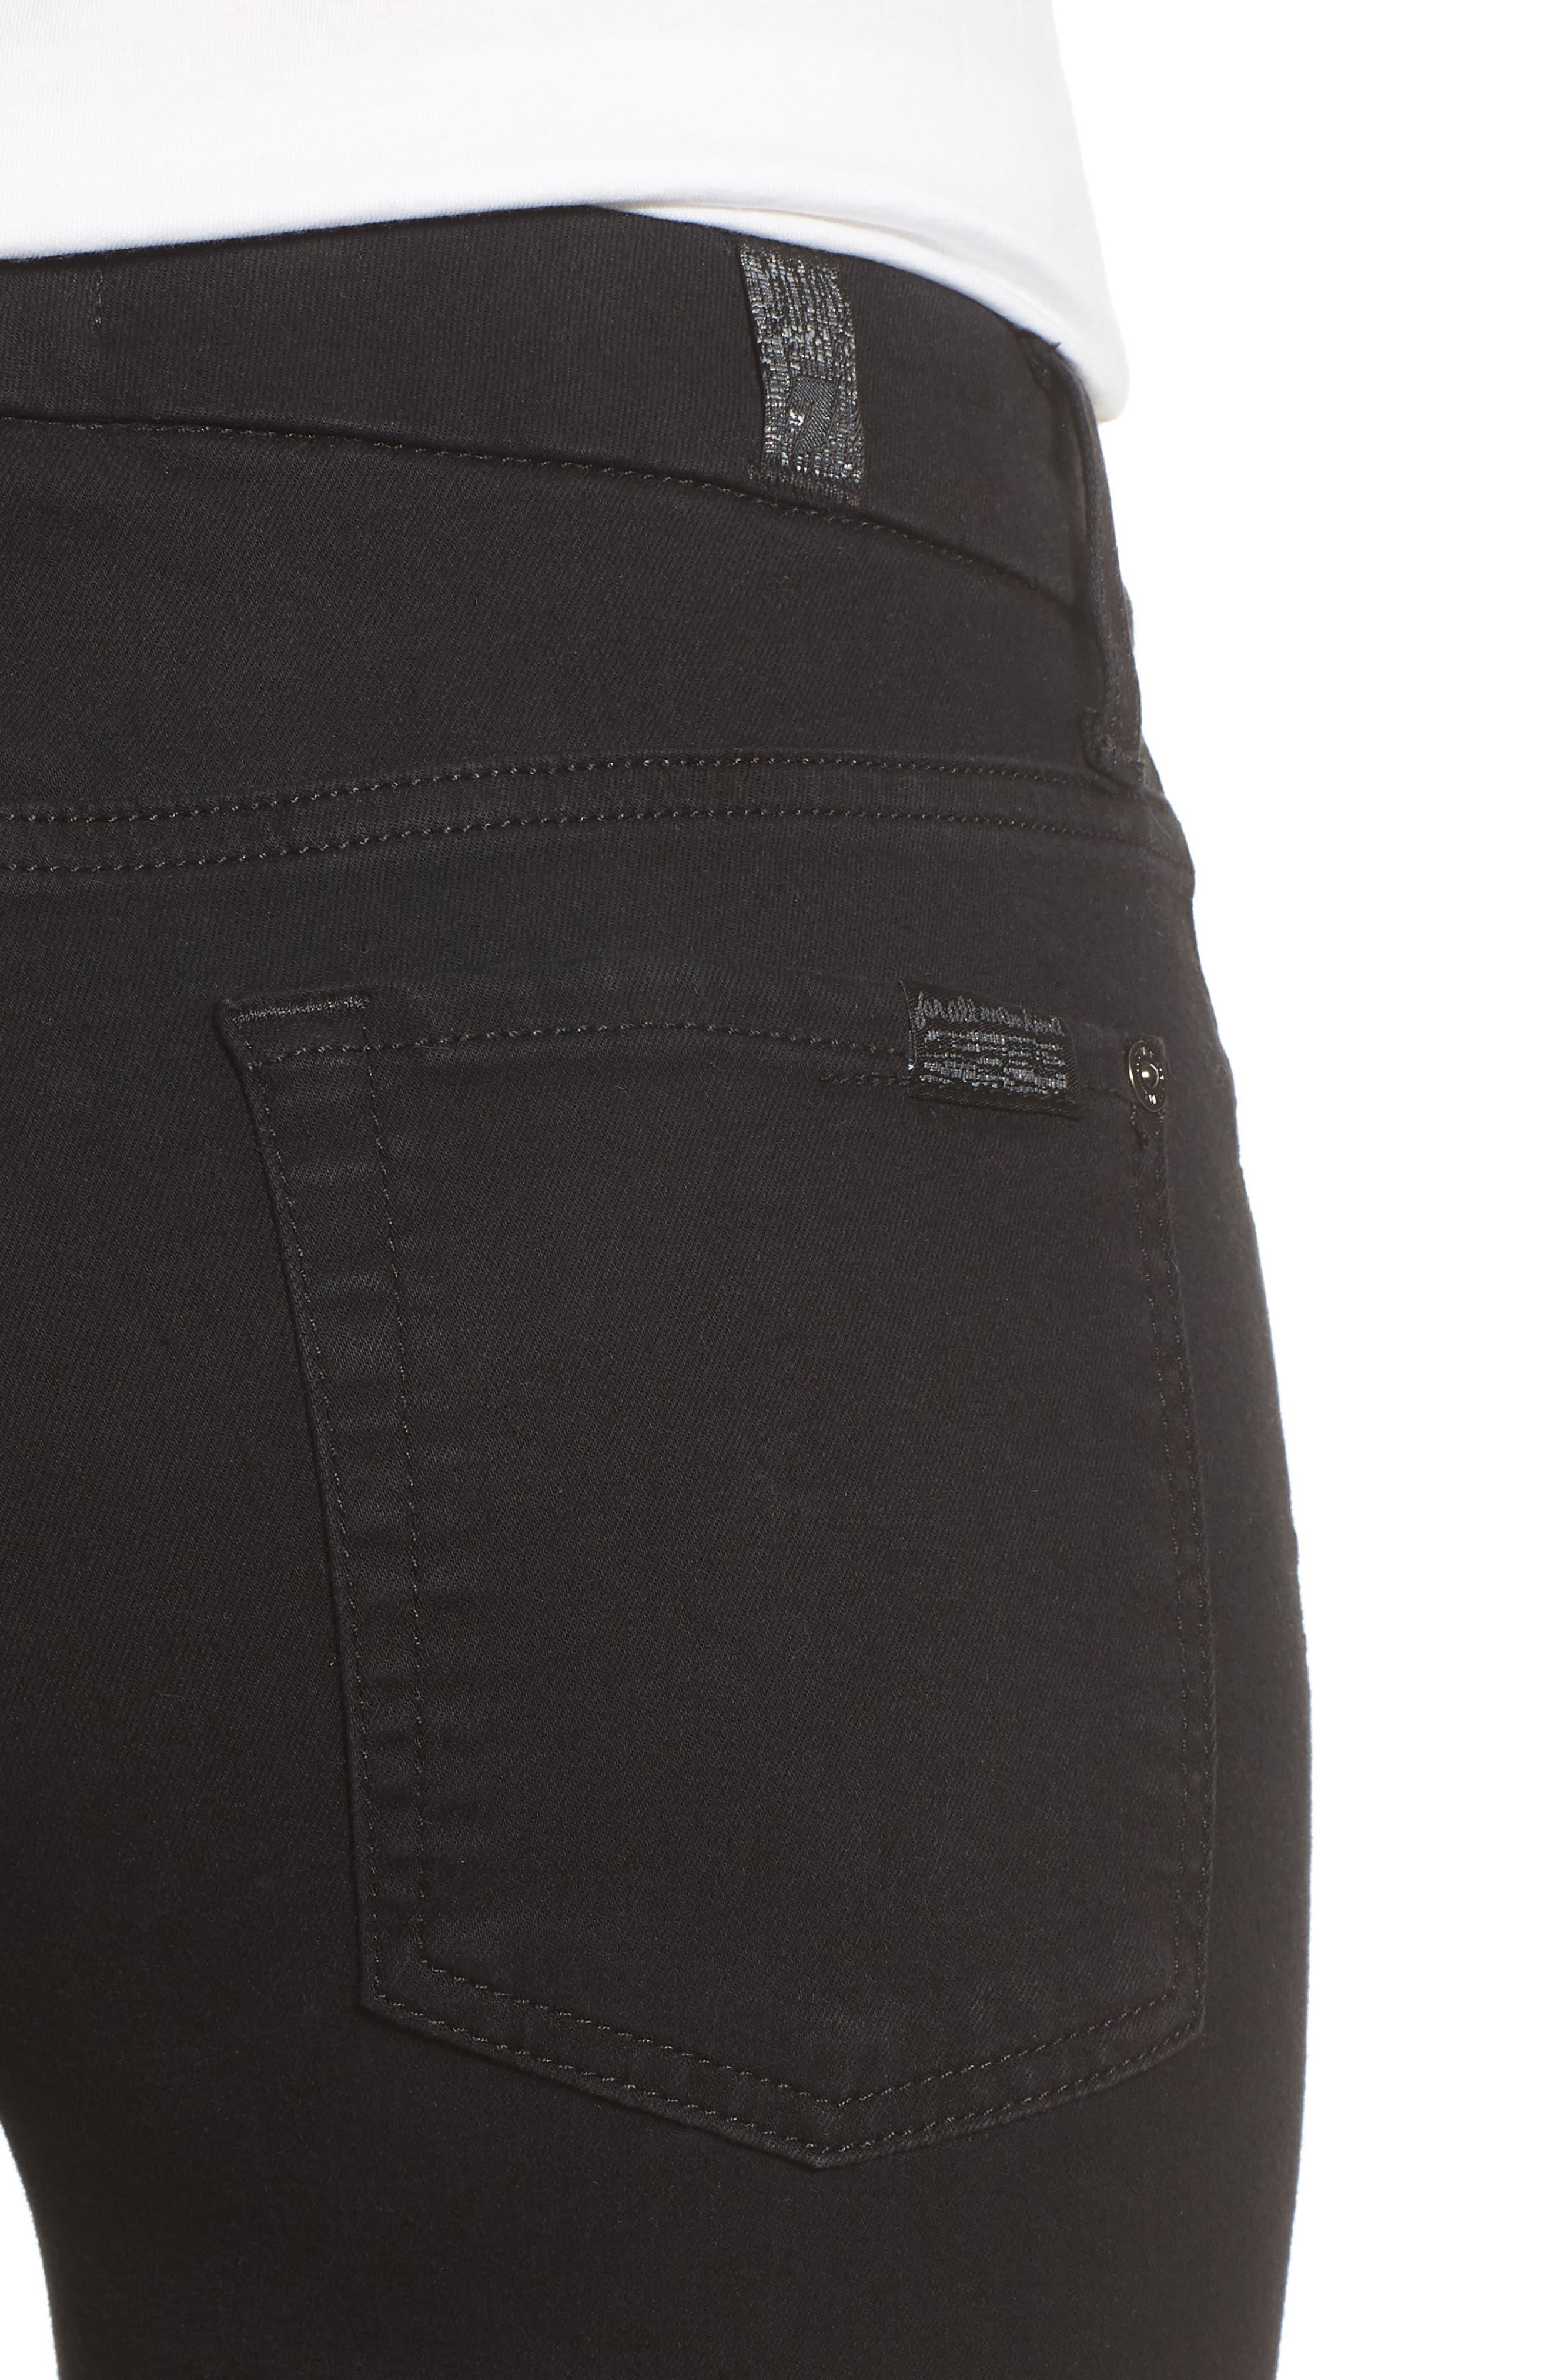 7 FOR ALL MANKIND<SUP>®</SUP>, b(air) Raw Hem Crop Skinny Jeans, Alternate thumbnail 5, color, BAIR BLACK